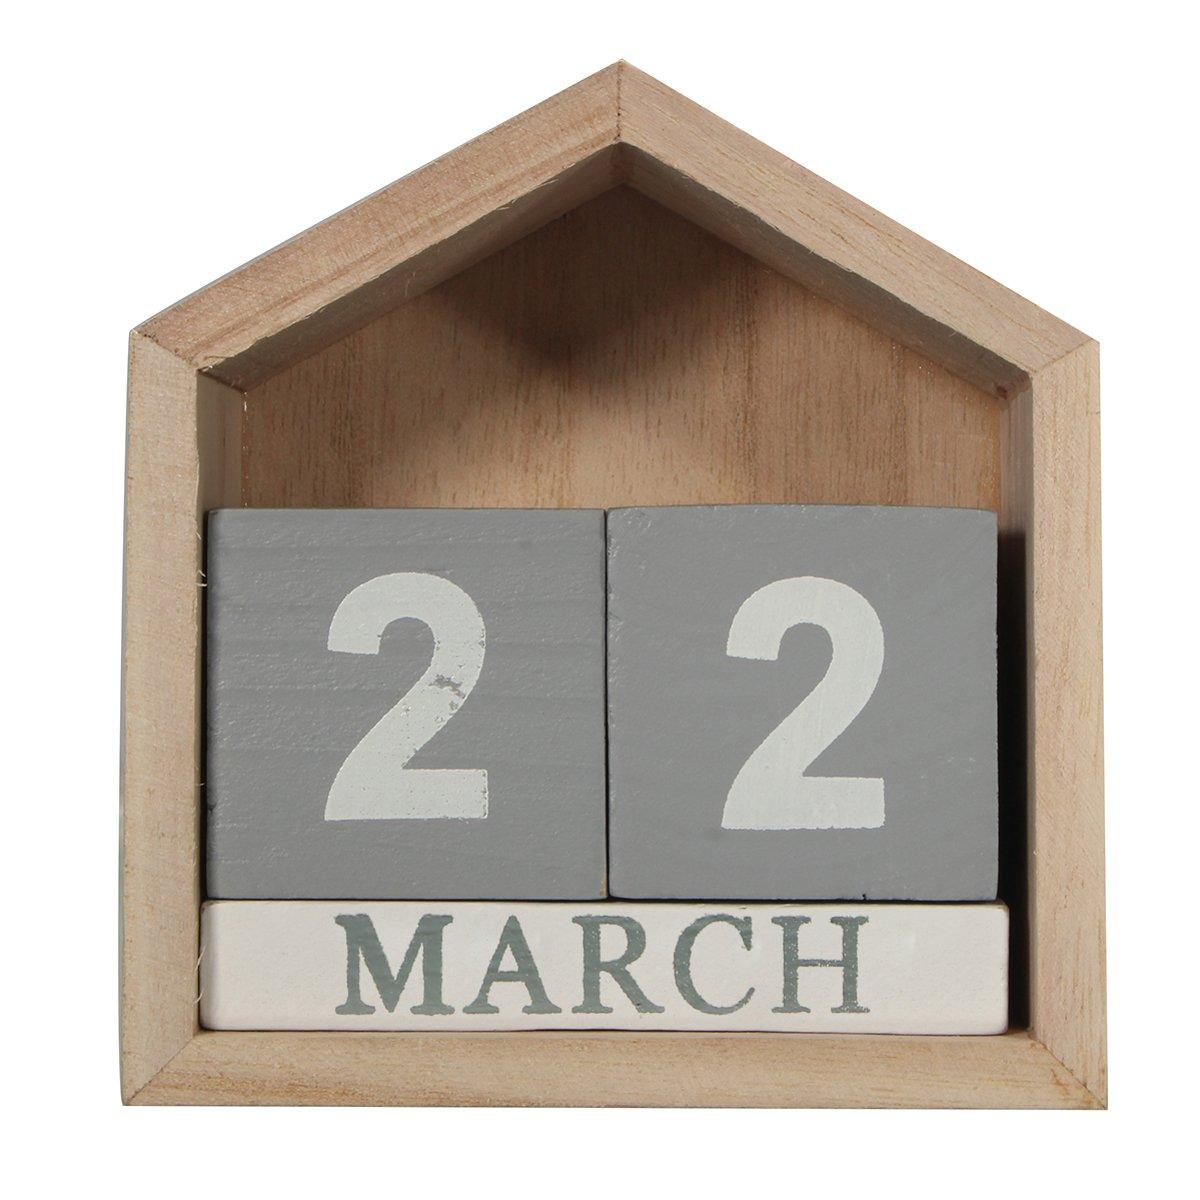 Jeteven Vintage Wood Perpetual Calendar, Shabby Chic Blocks Calendar Home Office Desktop Decoration, Grey, 4.33''X2.17''X4.53'' by Jeteven